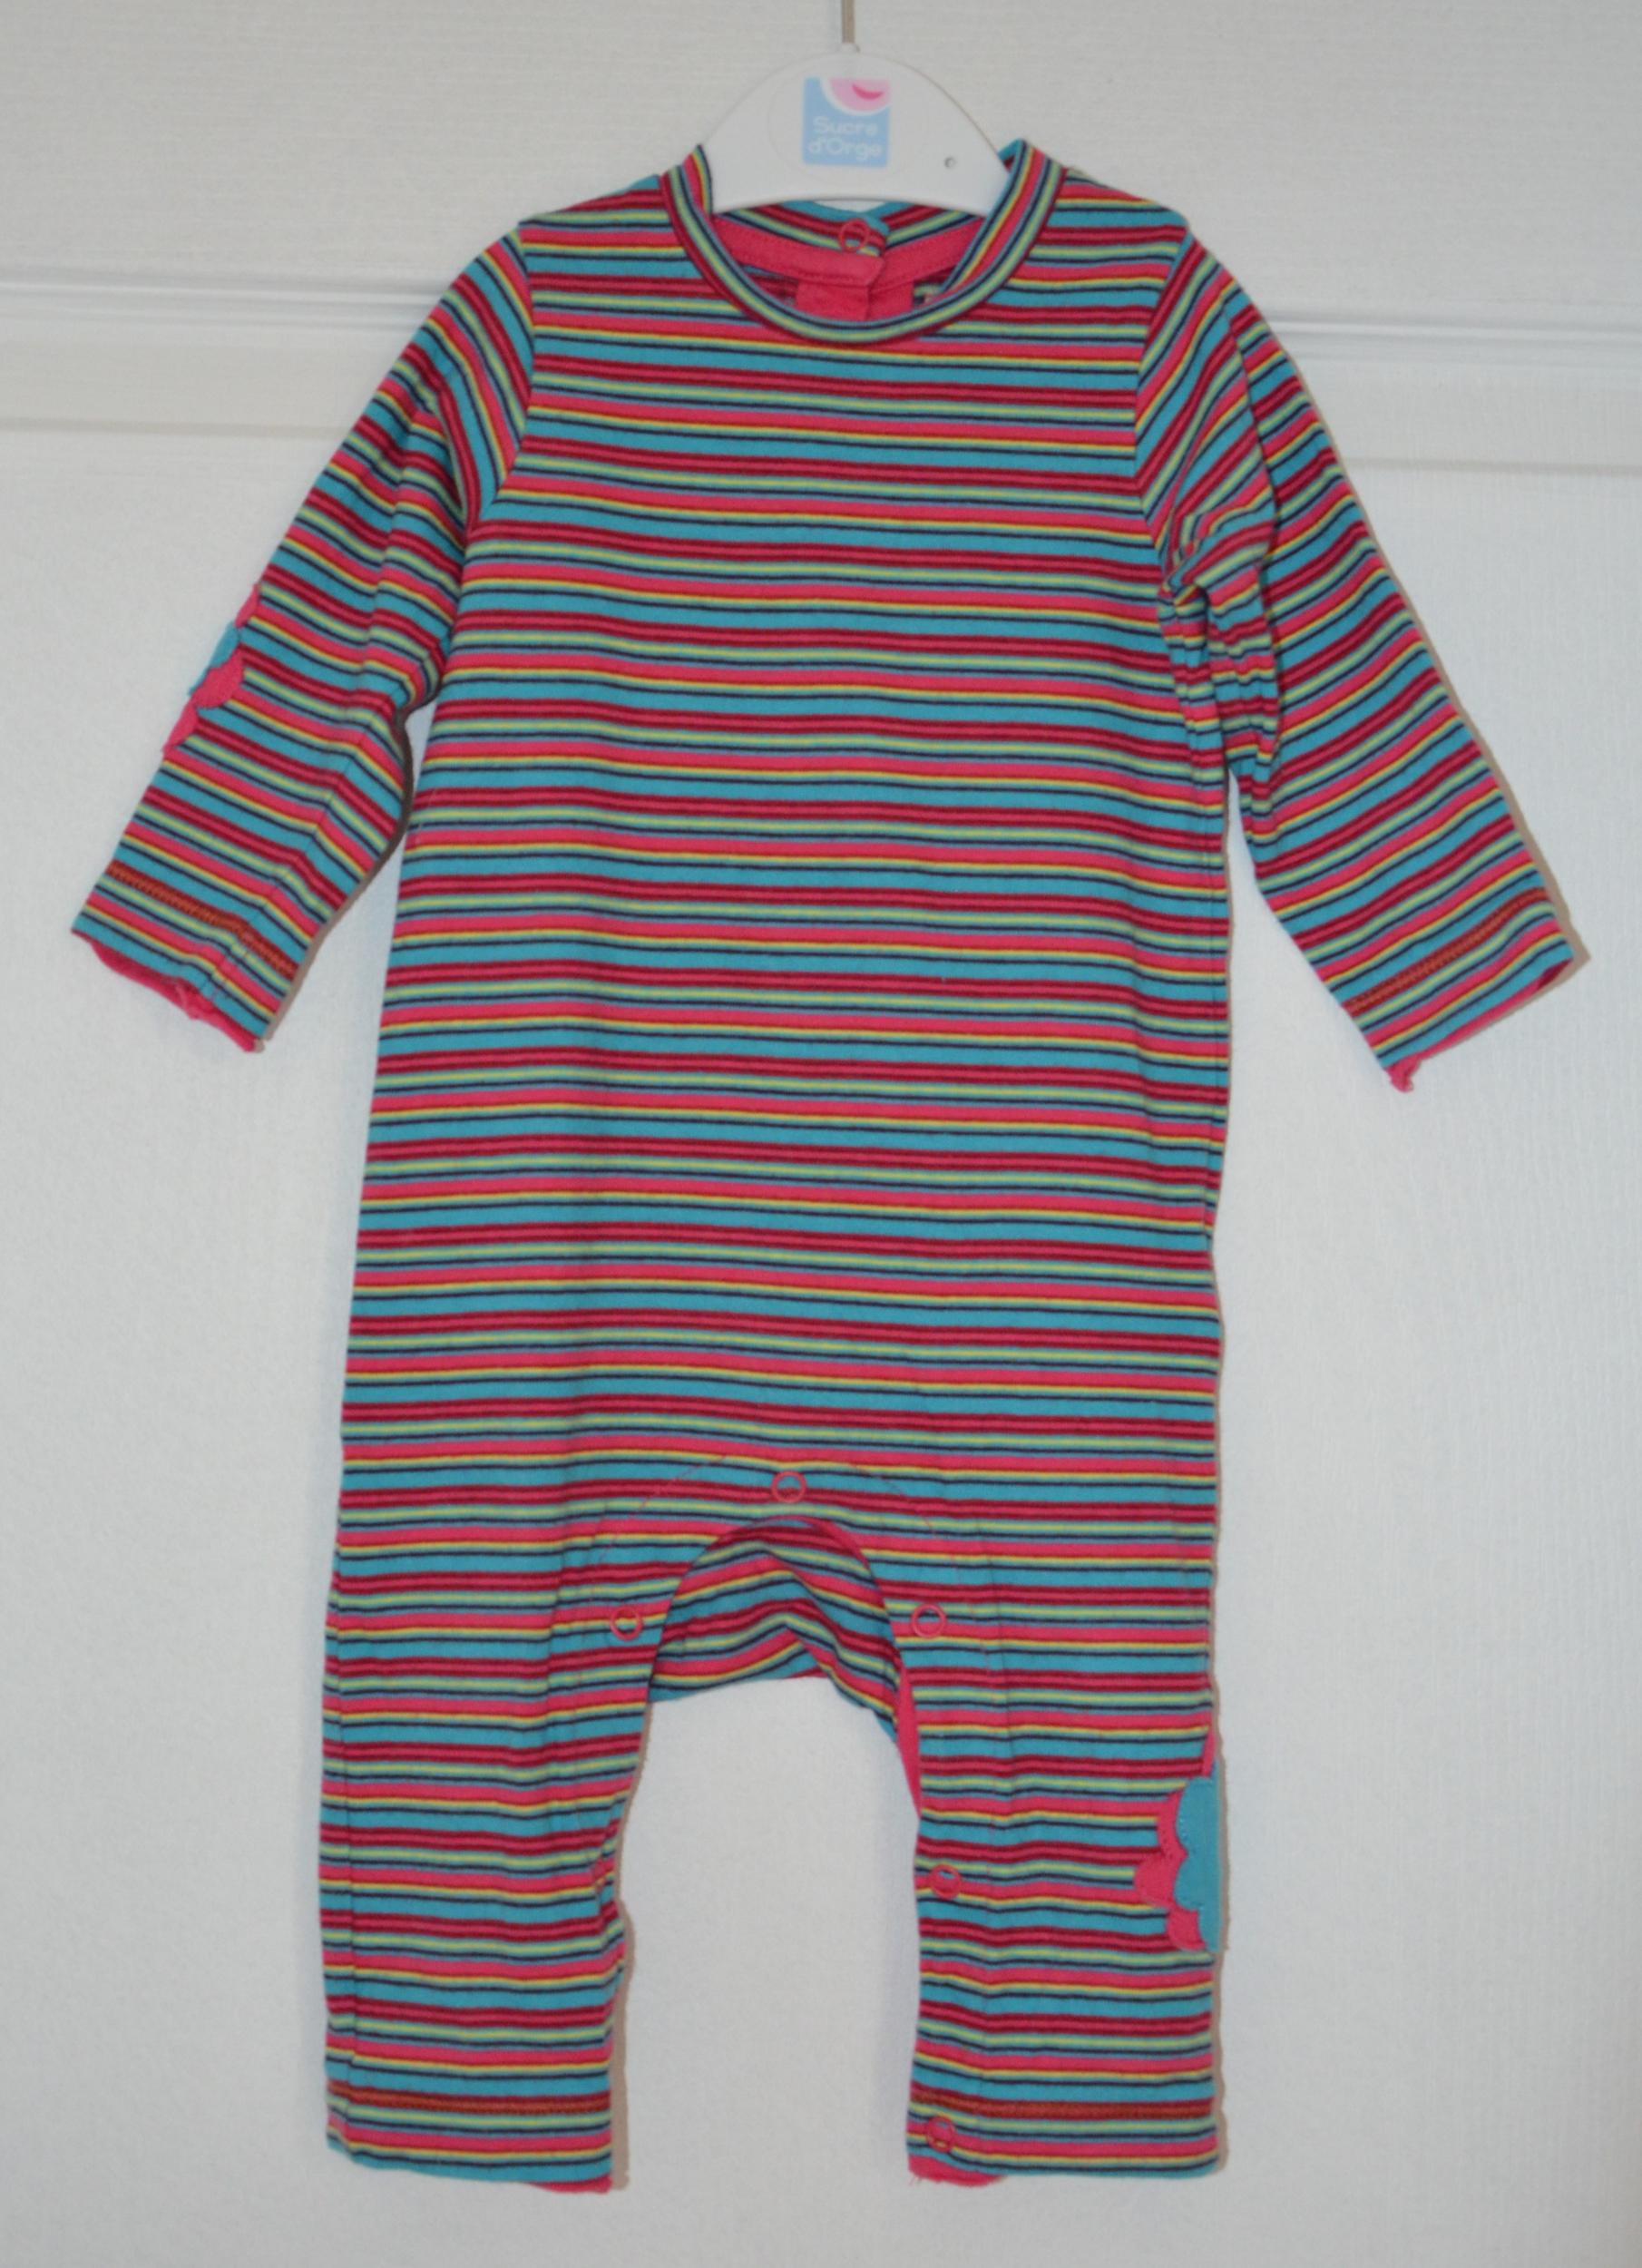 pyjama fille 6 mois orchestra rayé